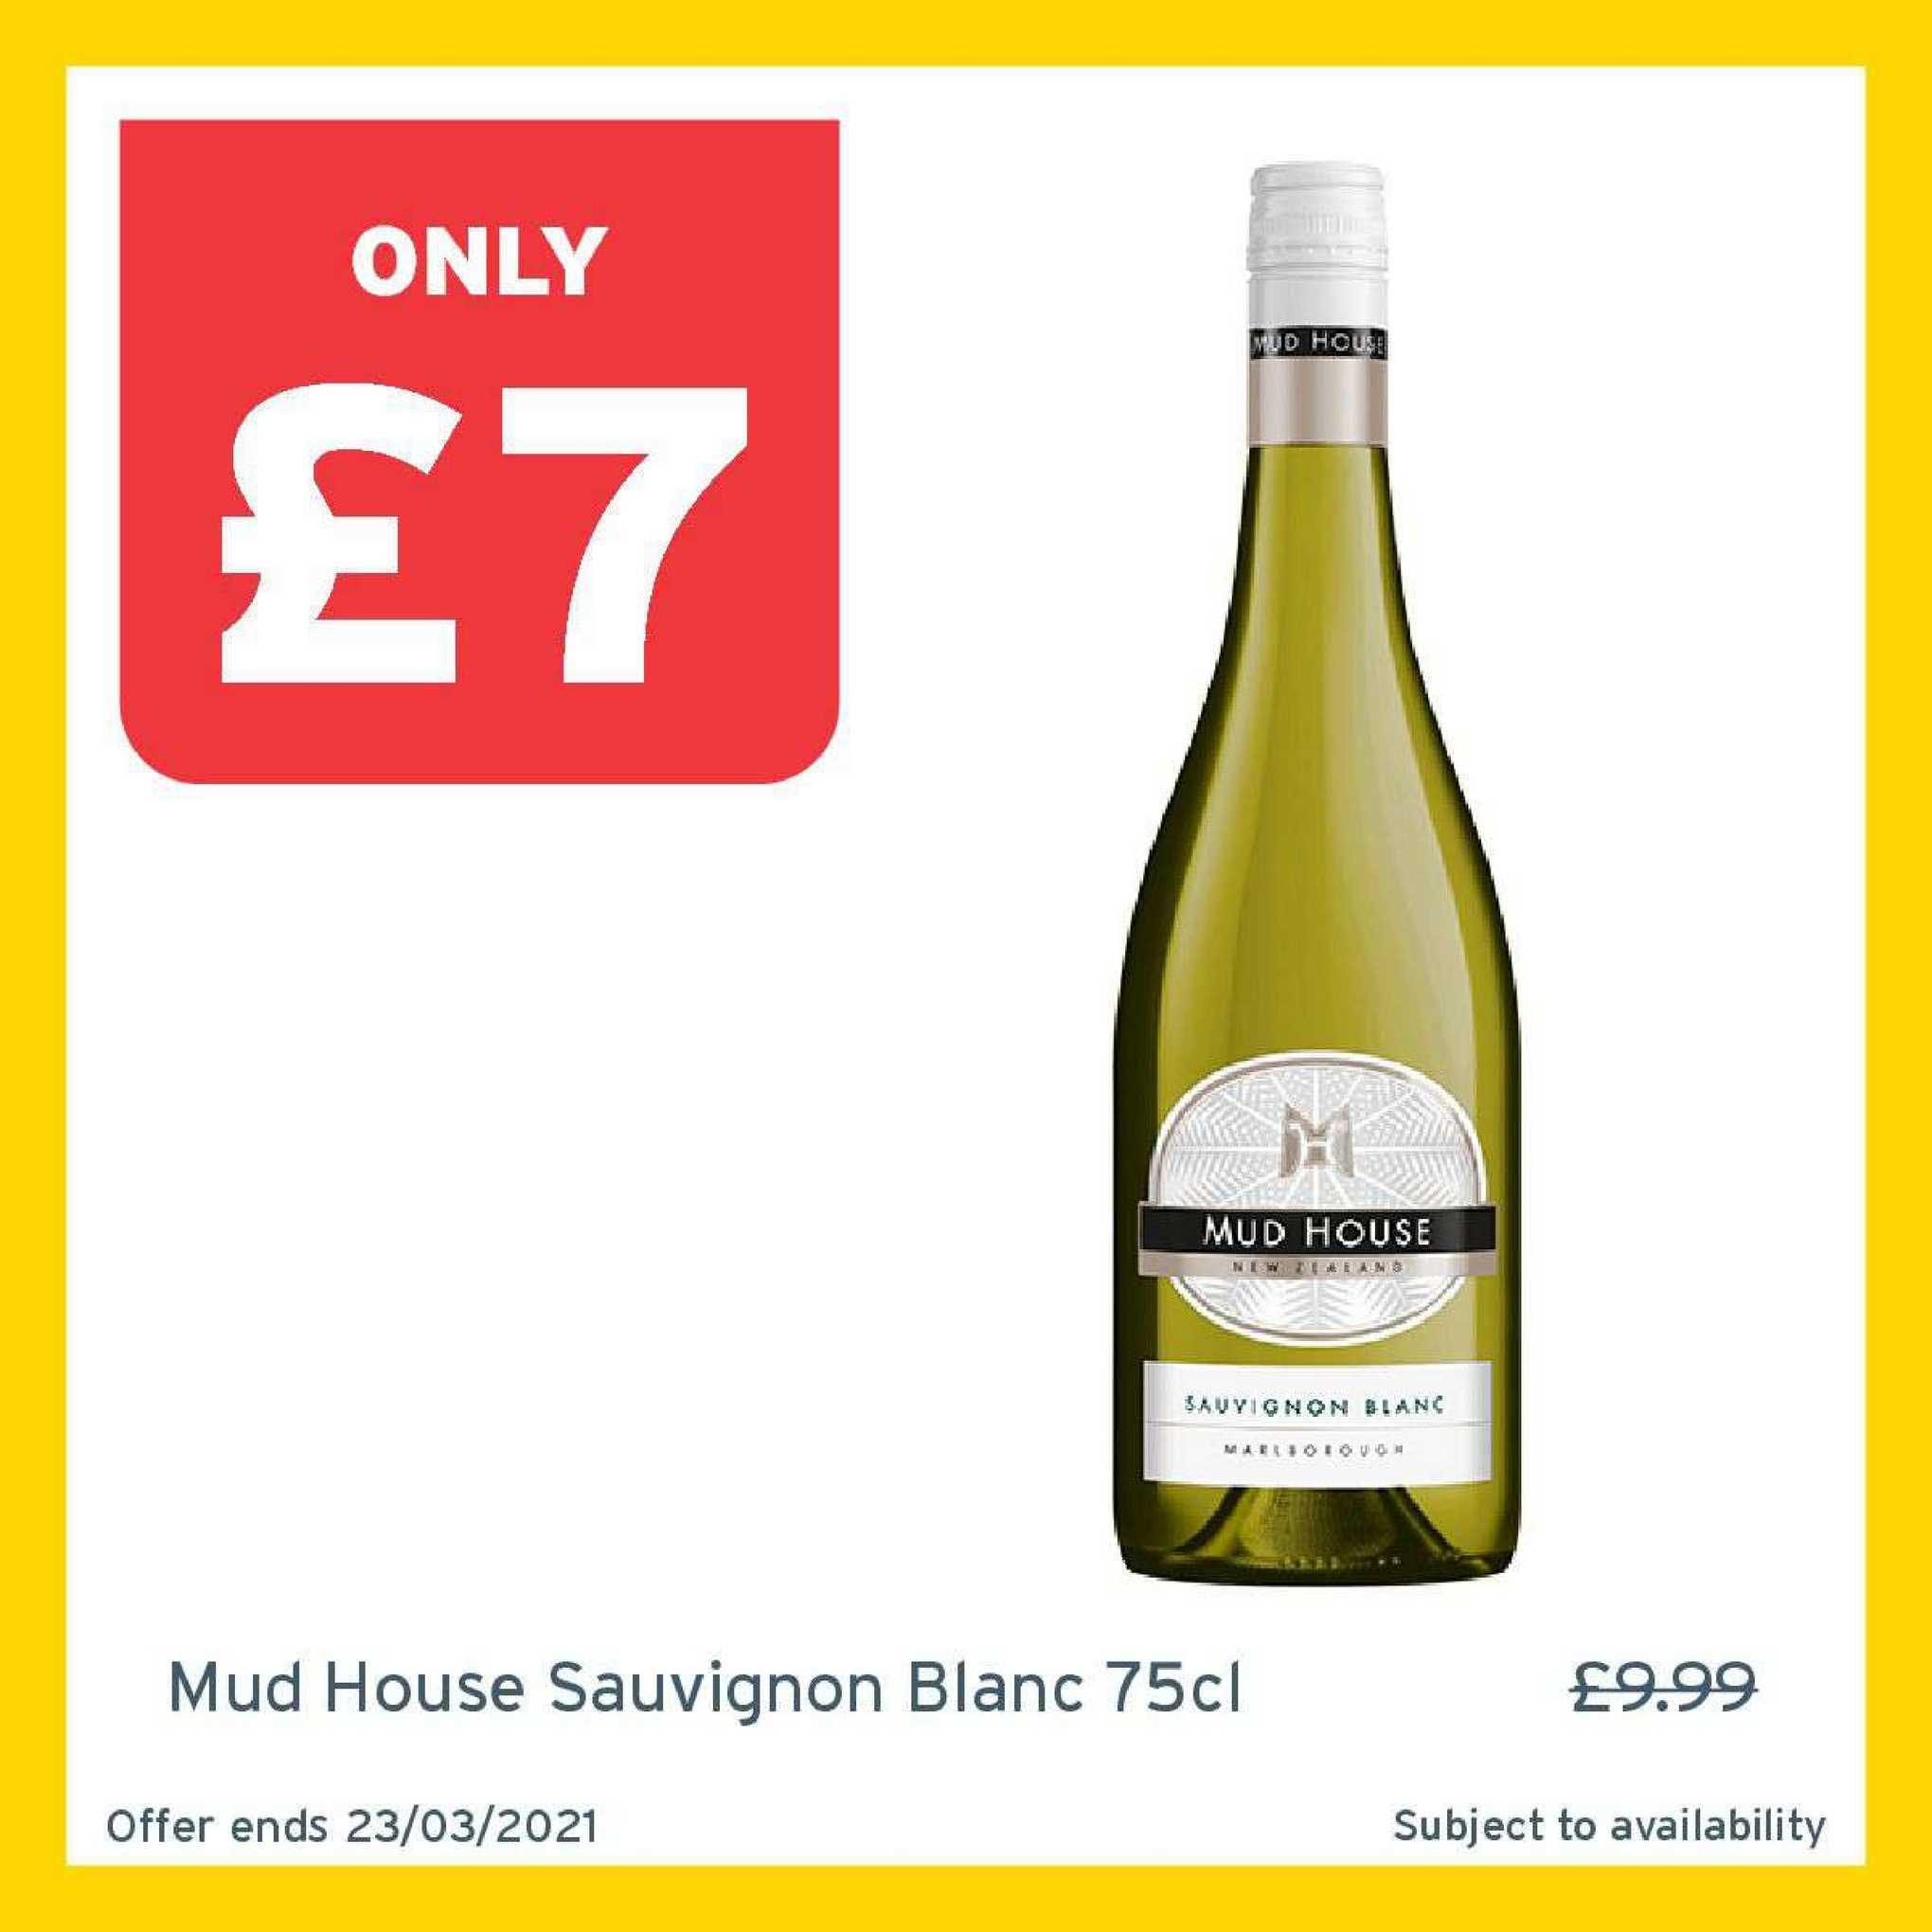 One Stop Mud House Sauvignon Blanc 75cl